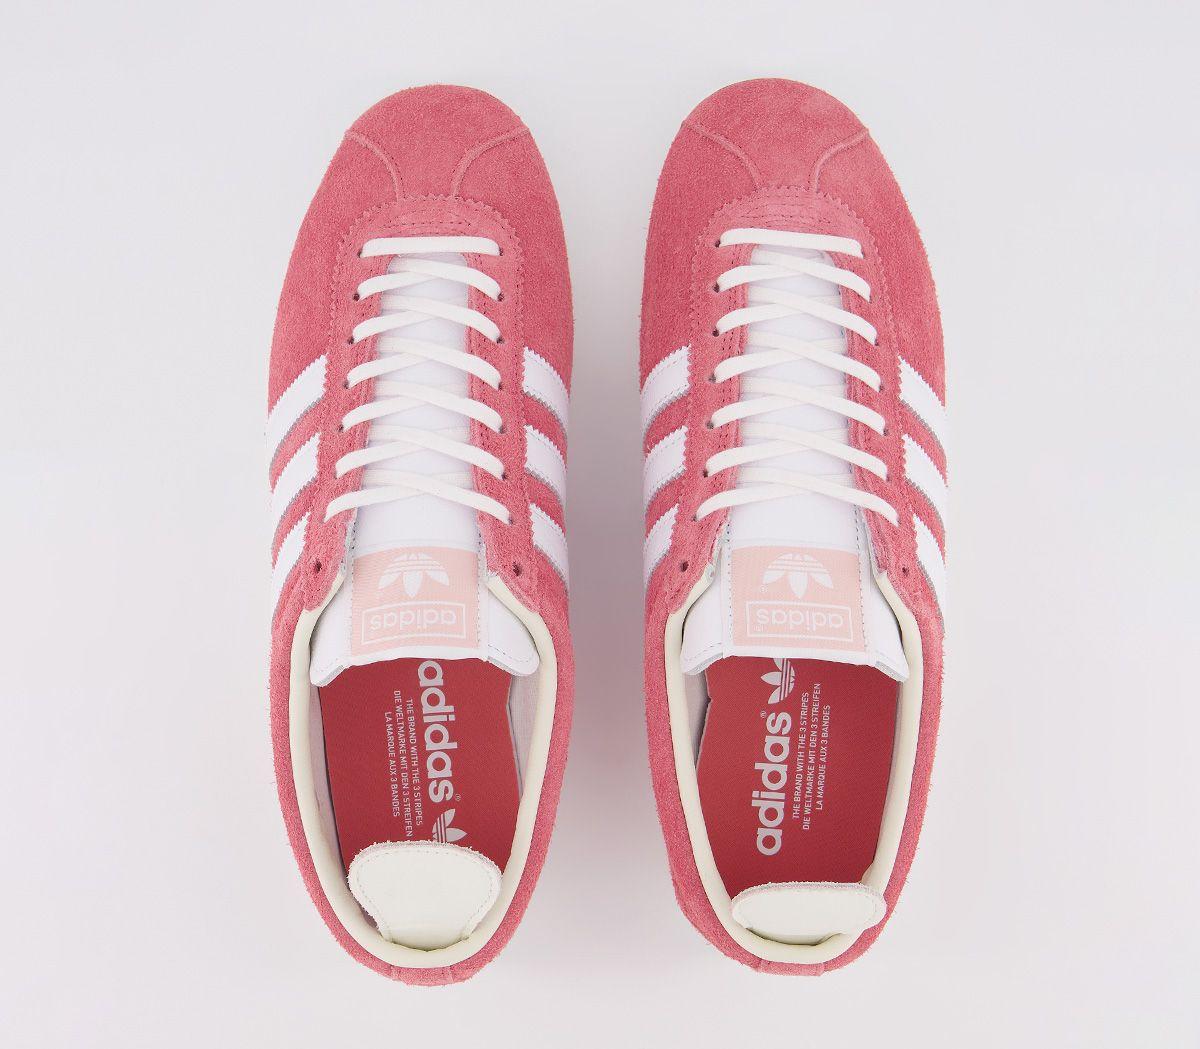 Adidas-Gazelle-Vintage-Baskets-Real-Rose-Blanc-Blanc-Baskets-Chaussures miniature 5